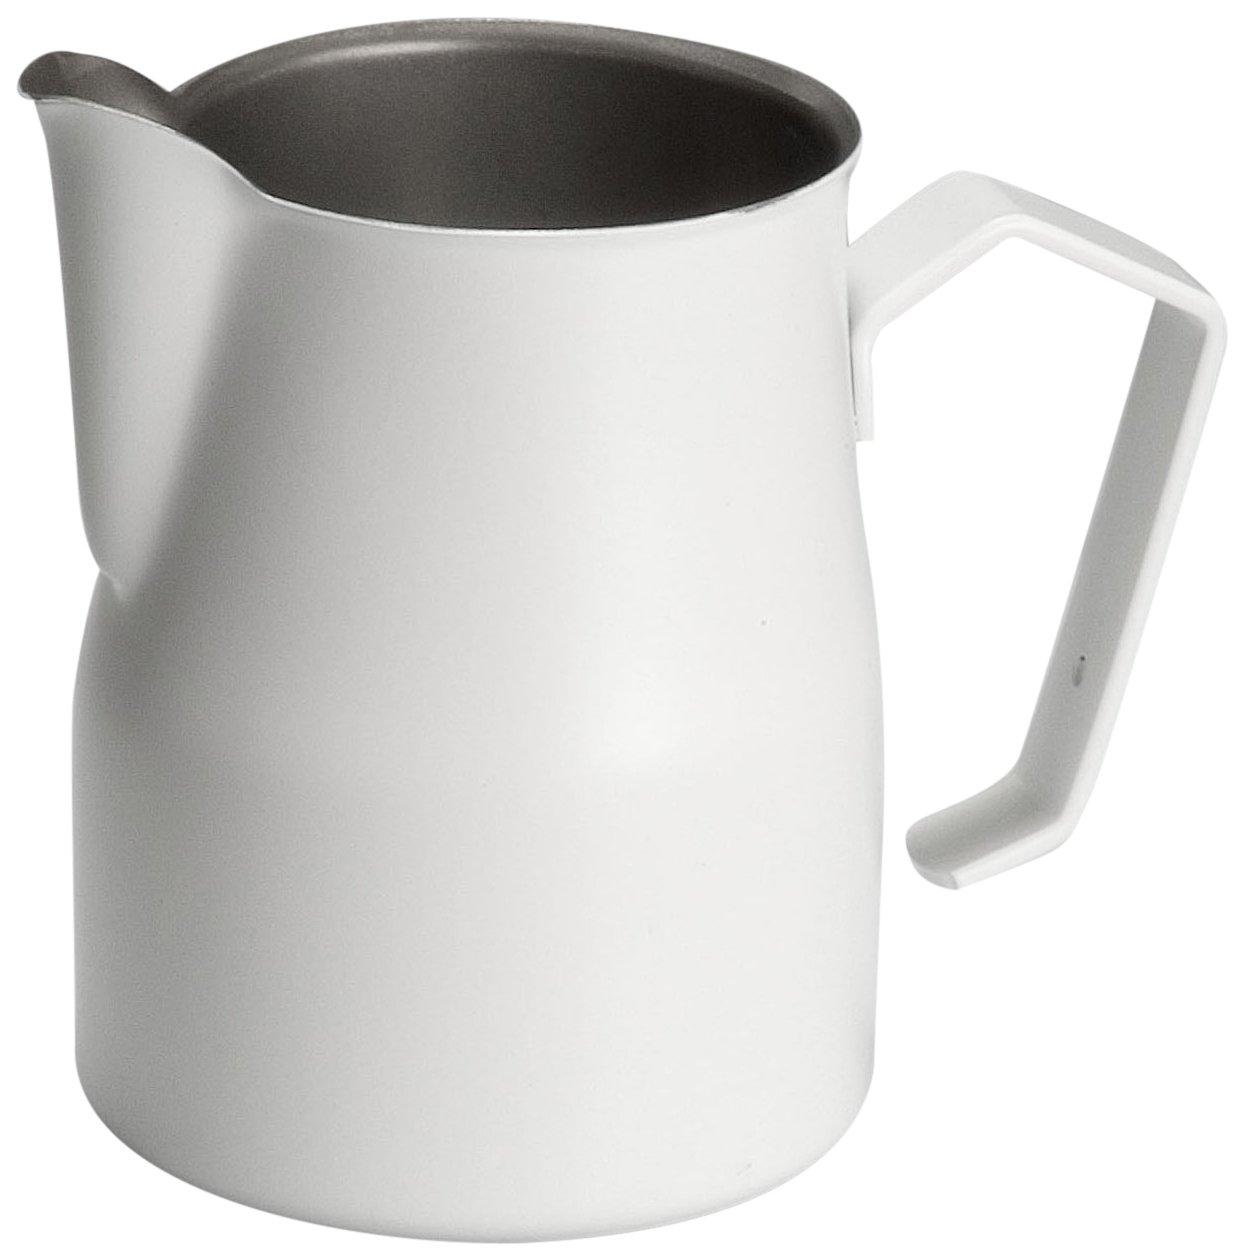 Motta Stainless Steel Professional Milk Pitcher/Jugs, 17 Fluid Ounce, White by Metallurgica Motta